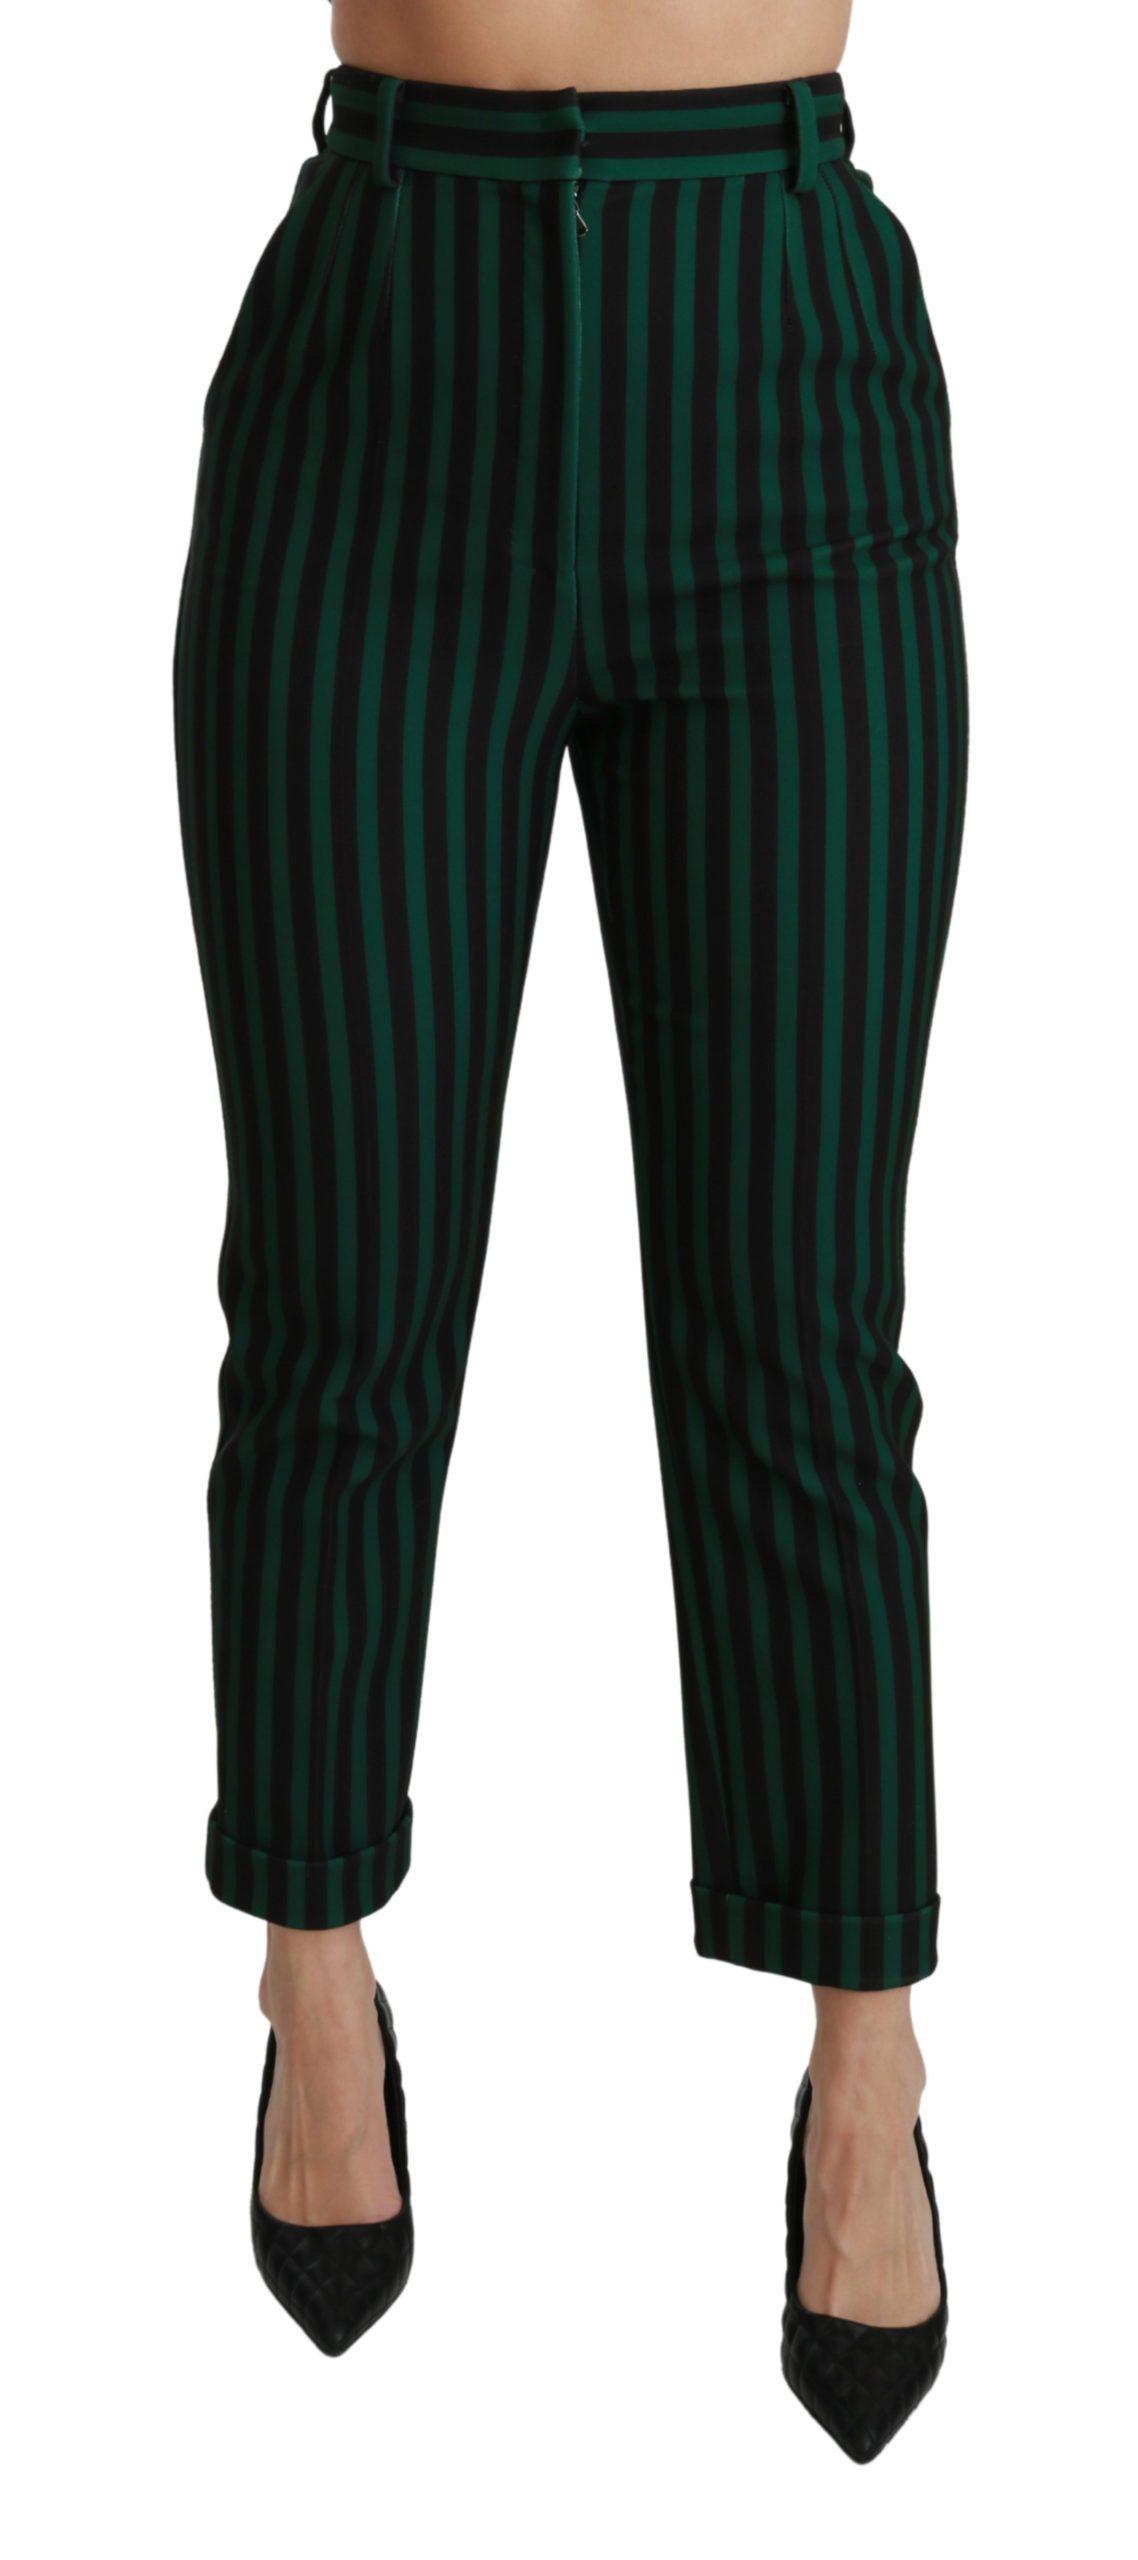 Dolce & Gabbana Women's Striped High Waist Trouser Black PAN70927 - IT40|S